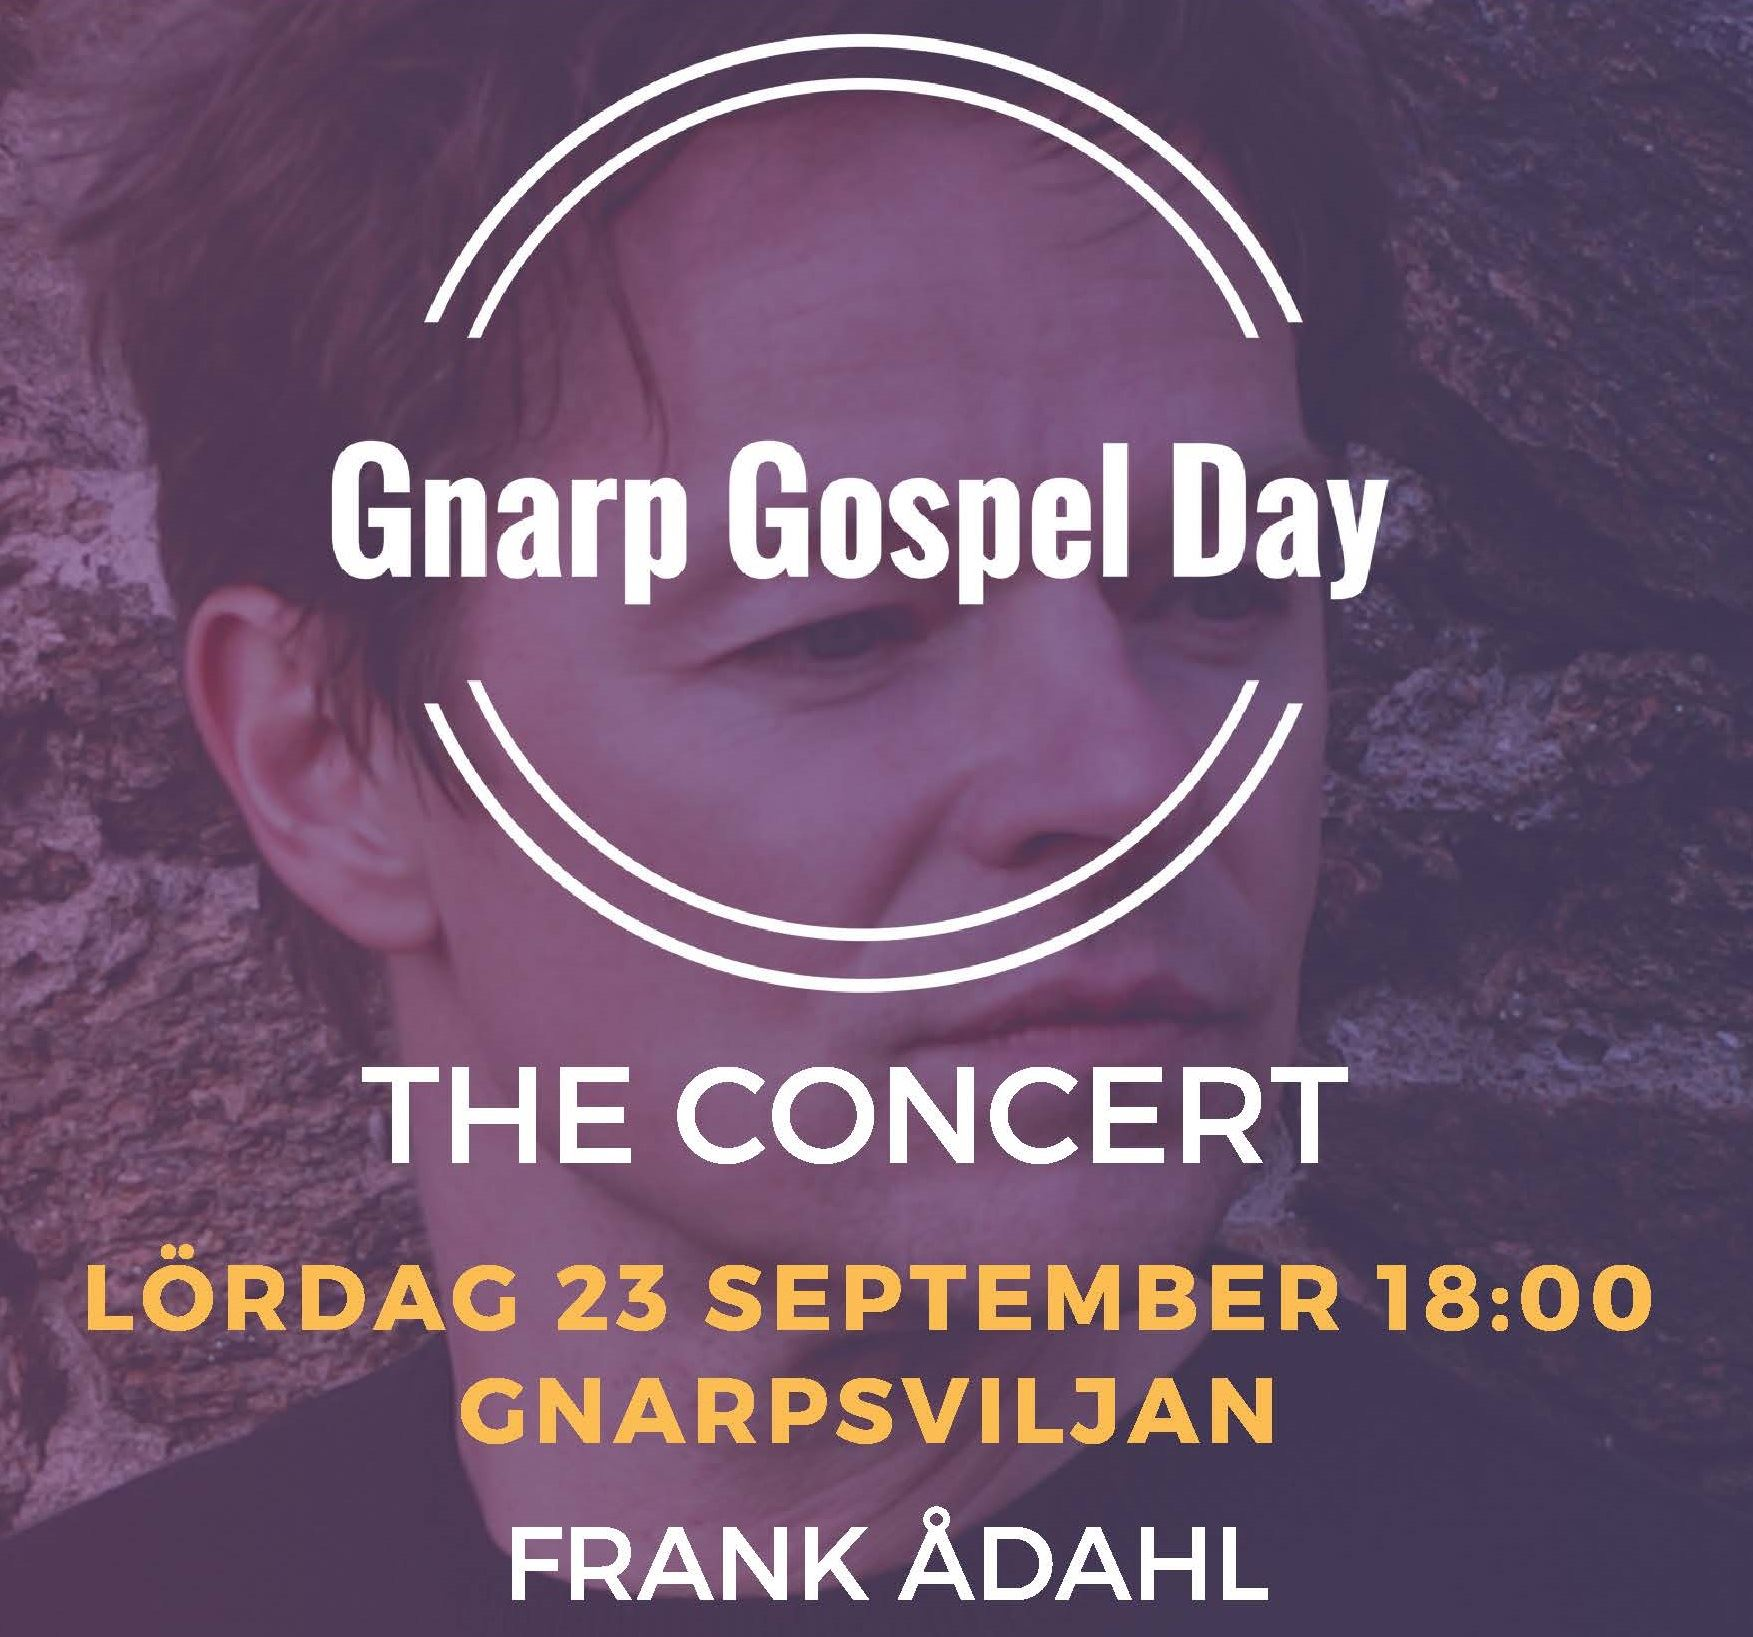 Gnarp Gospel Day